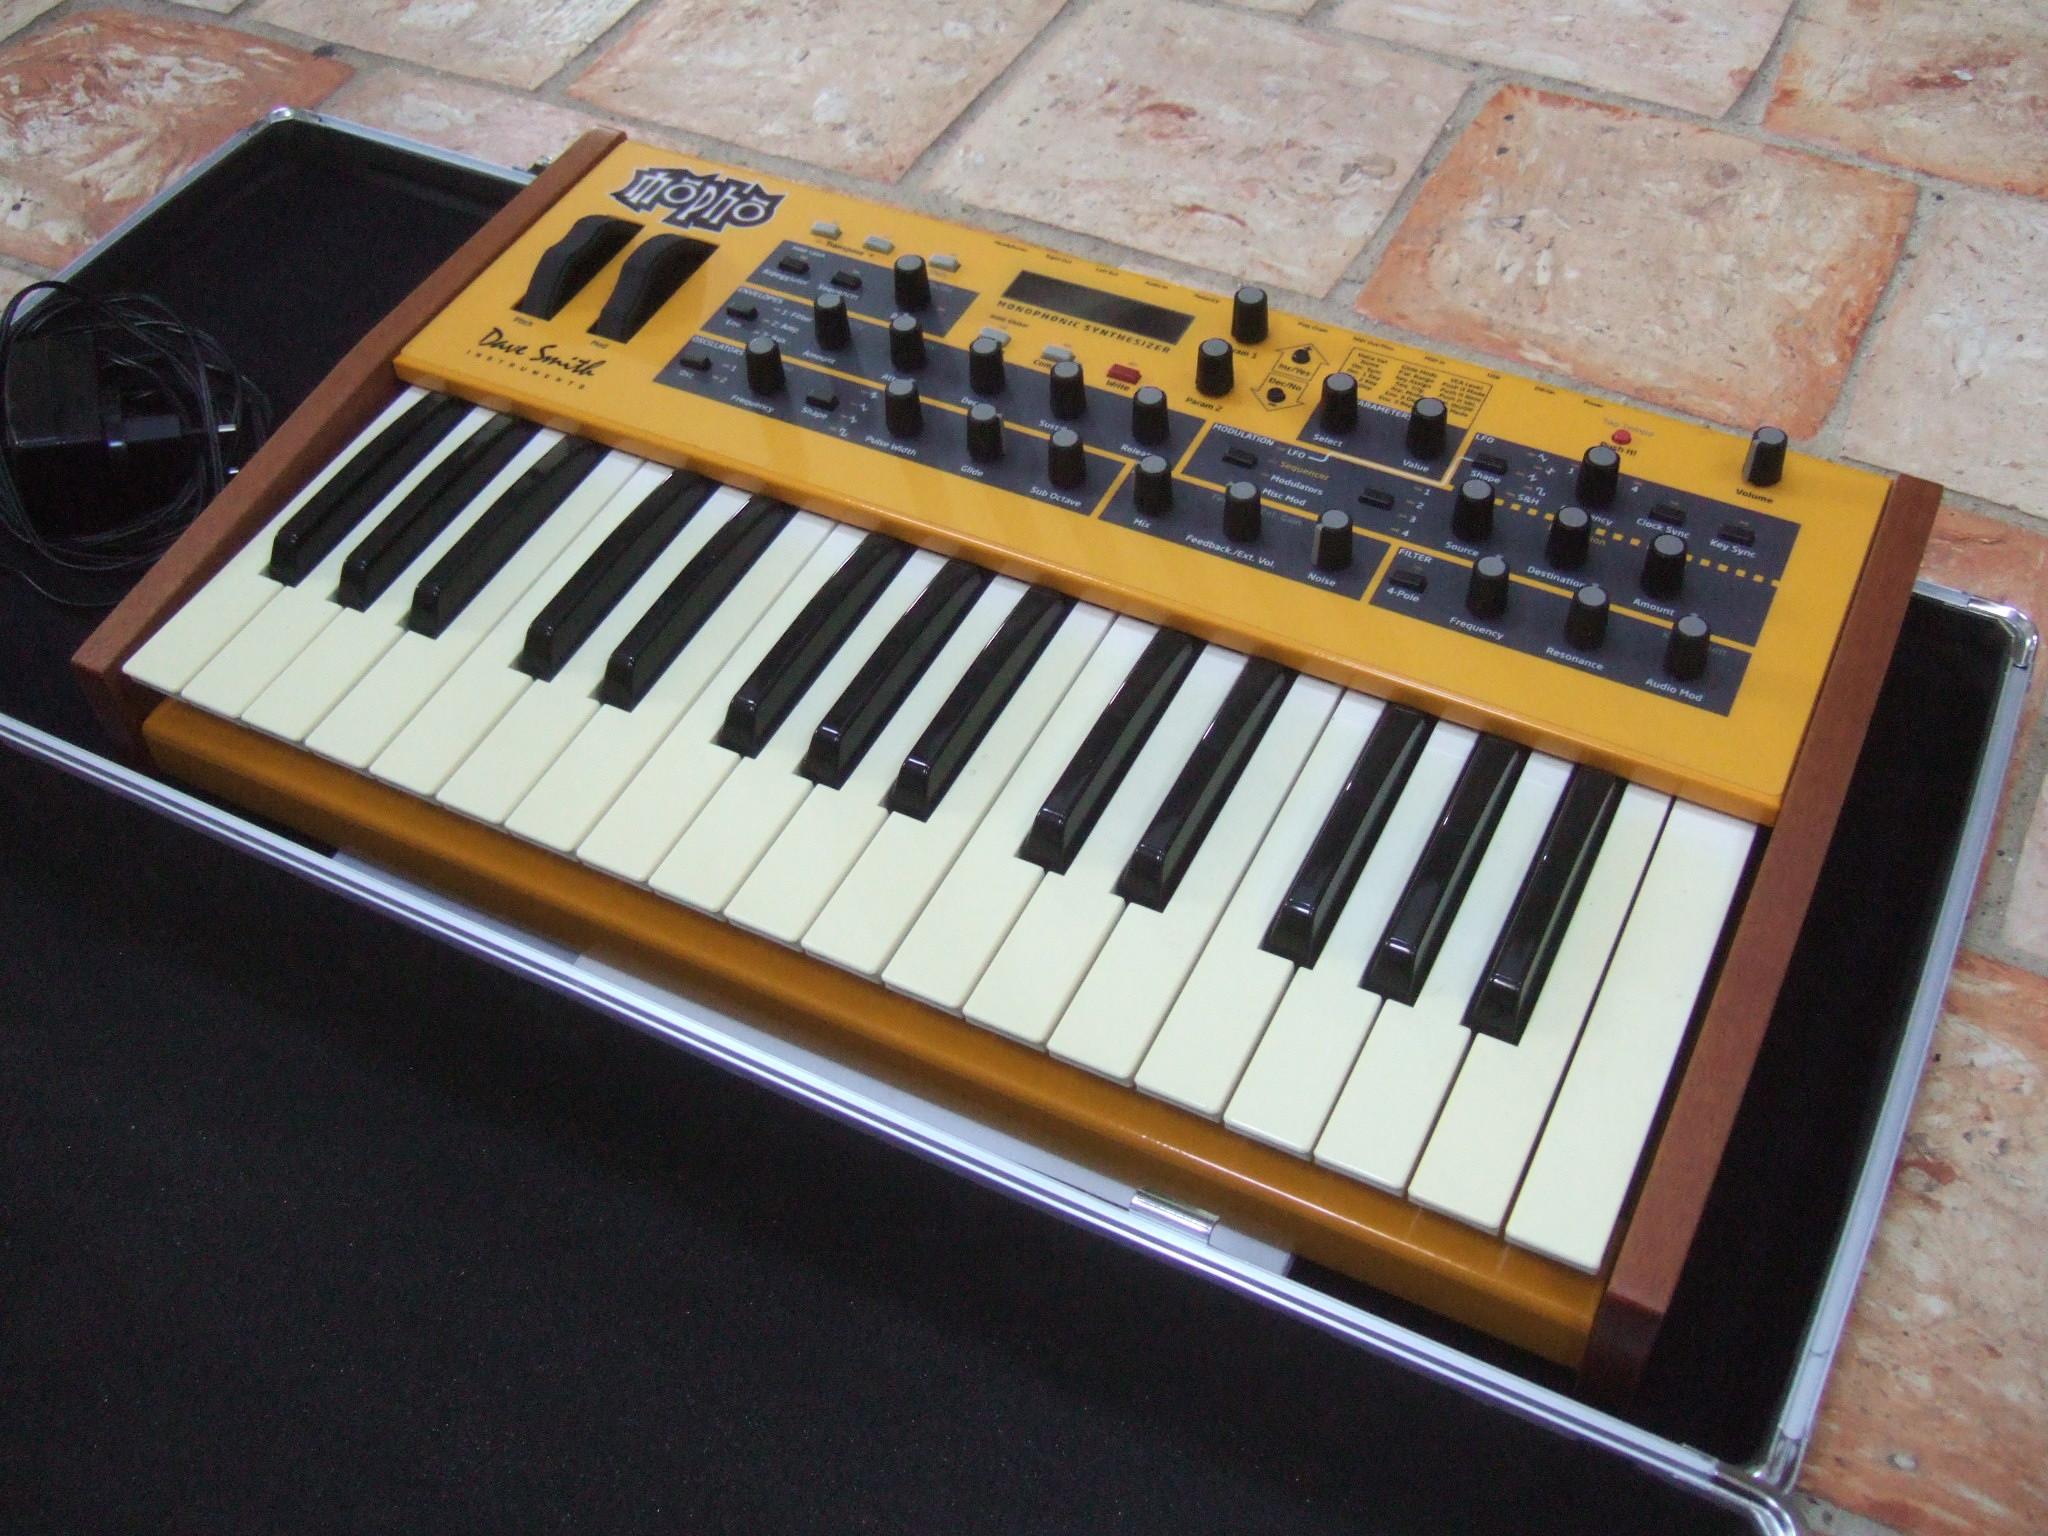 dave smith instruments mopho keyboard image 1796264 audiofanzine. Black Bedroom Furniture Sets. Home Design Ideas